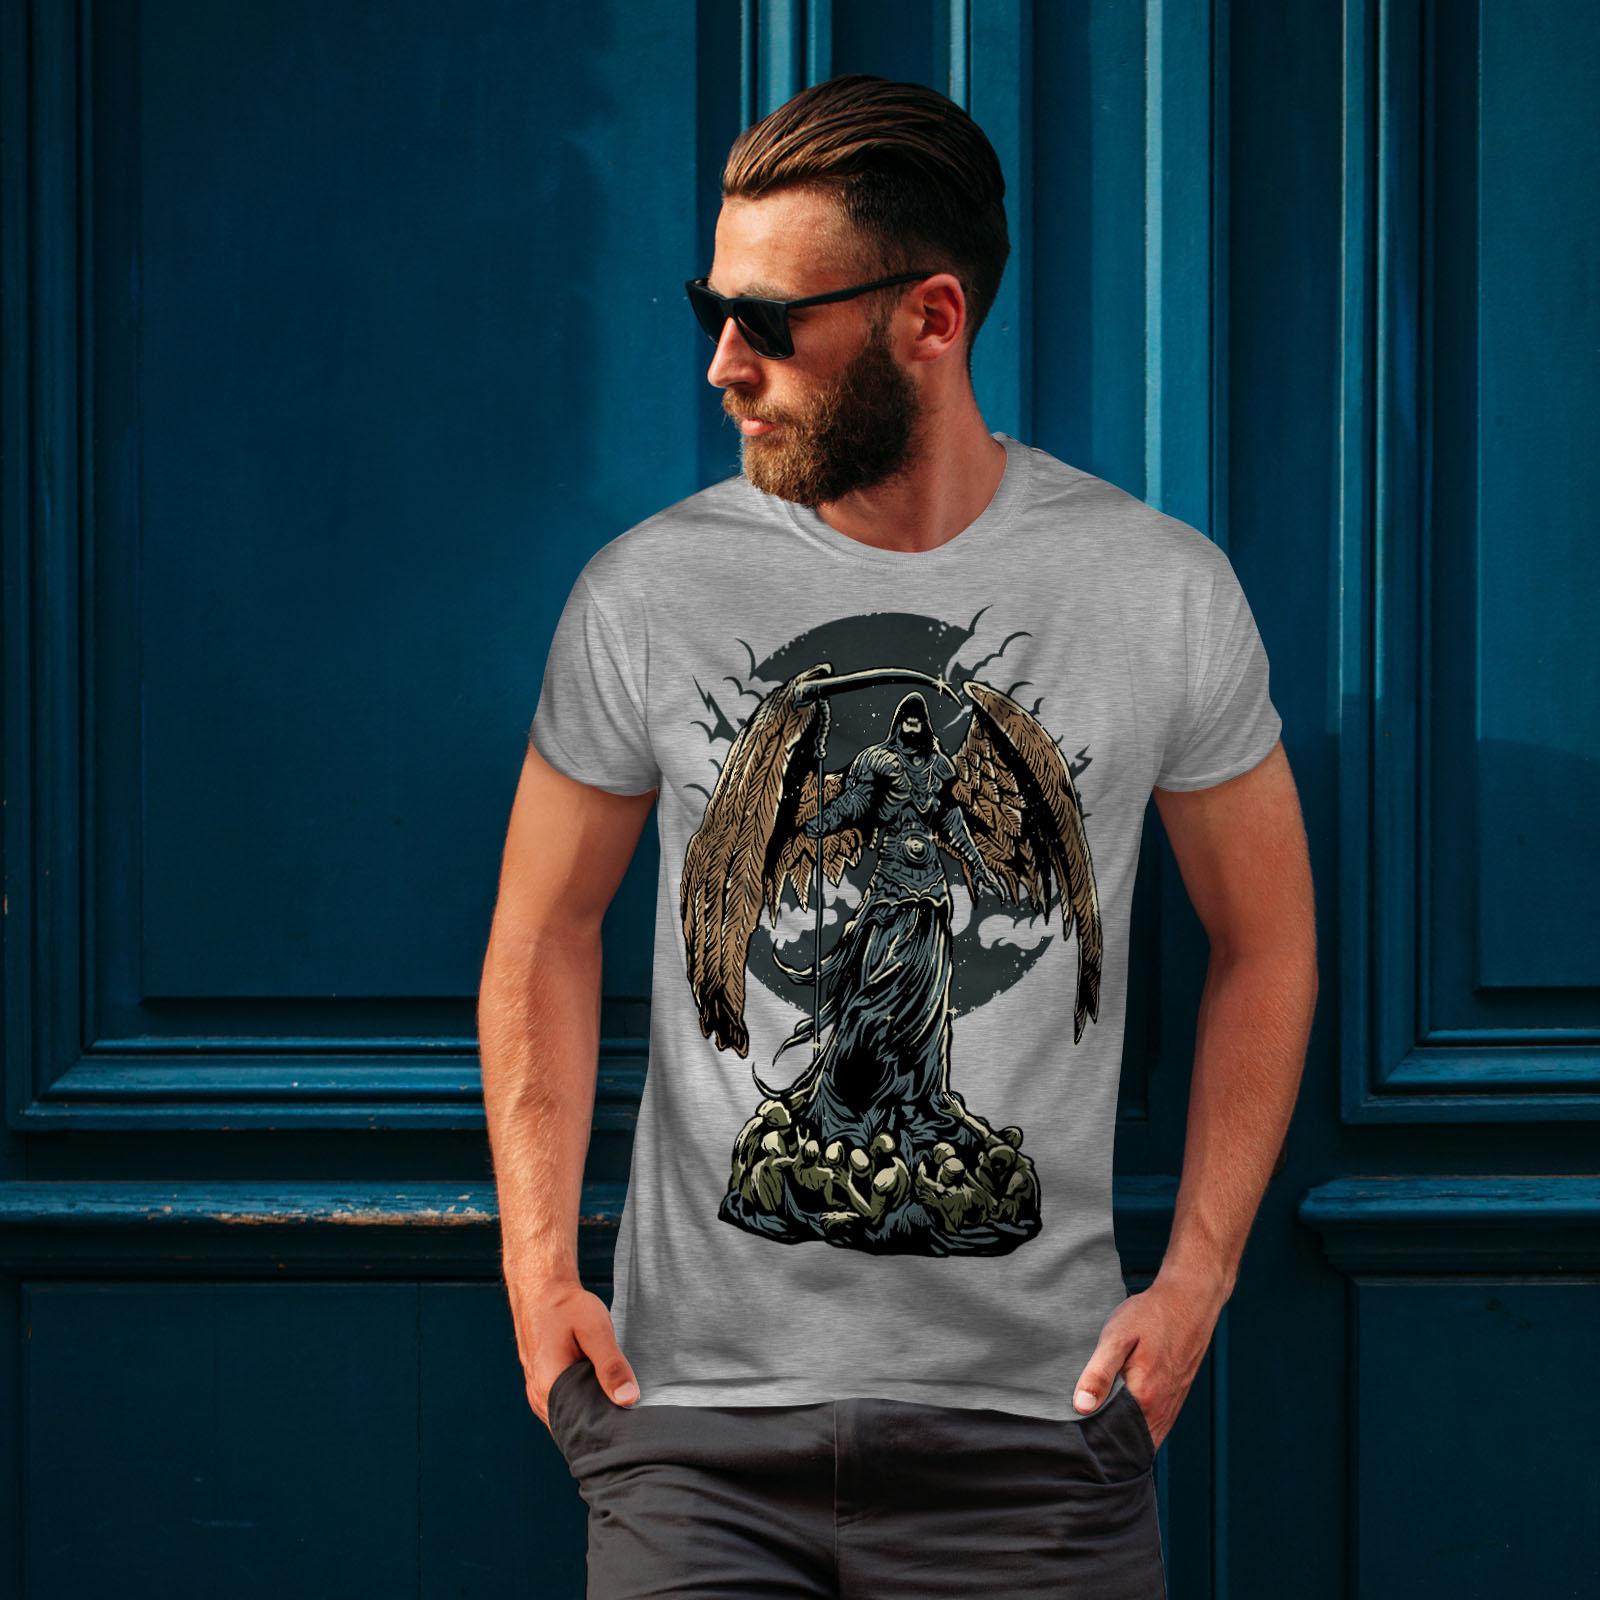 Wellcoda-Evil-Grim-Reaper-Mens-T-shirt-Horror-Graphic-Design-Printed-Tee thumbnail 16